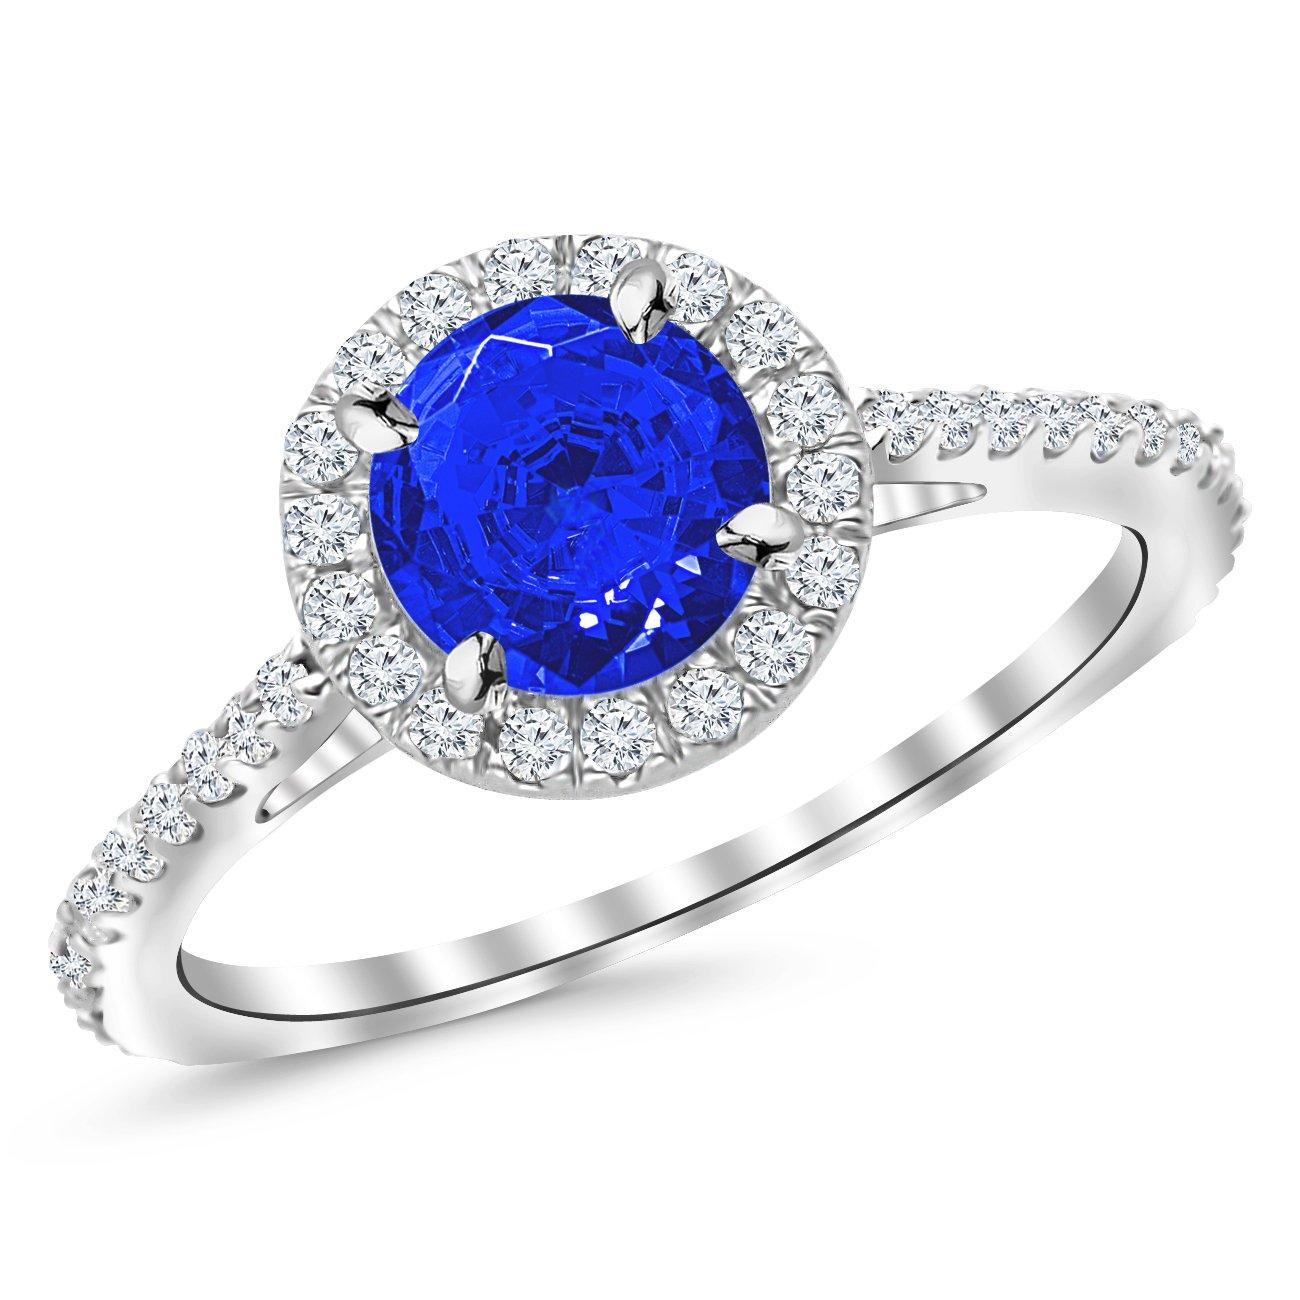 1.05 Ctw 14K White Gold Classic Round Diamond Engagement Ring w/ 0.75 Carat Blue Sapphire